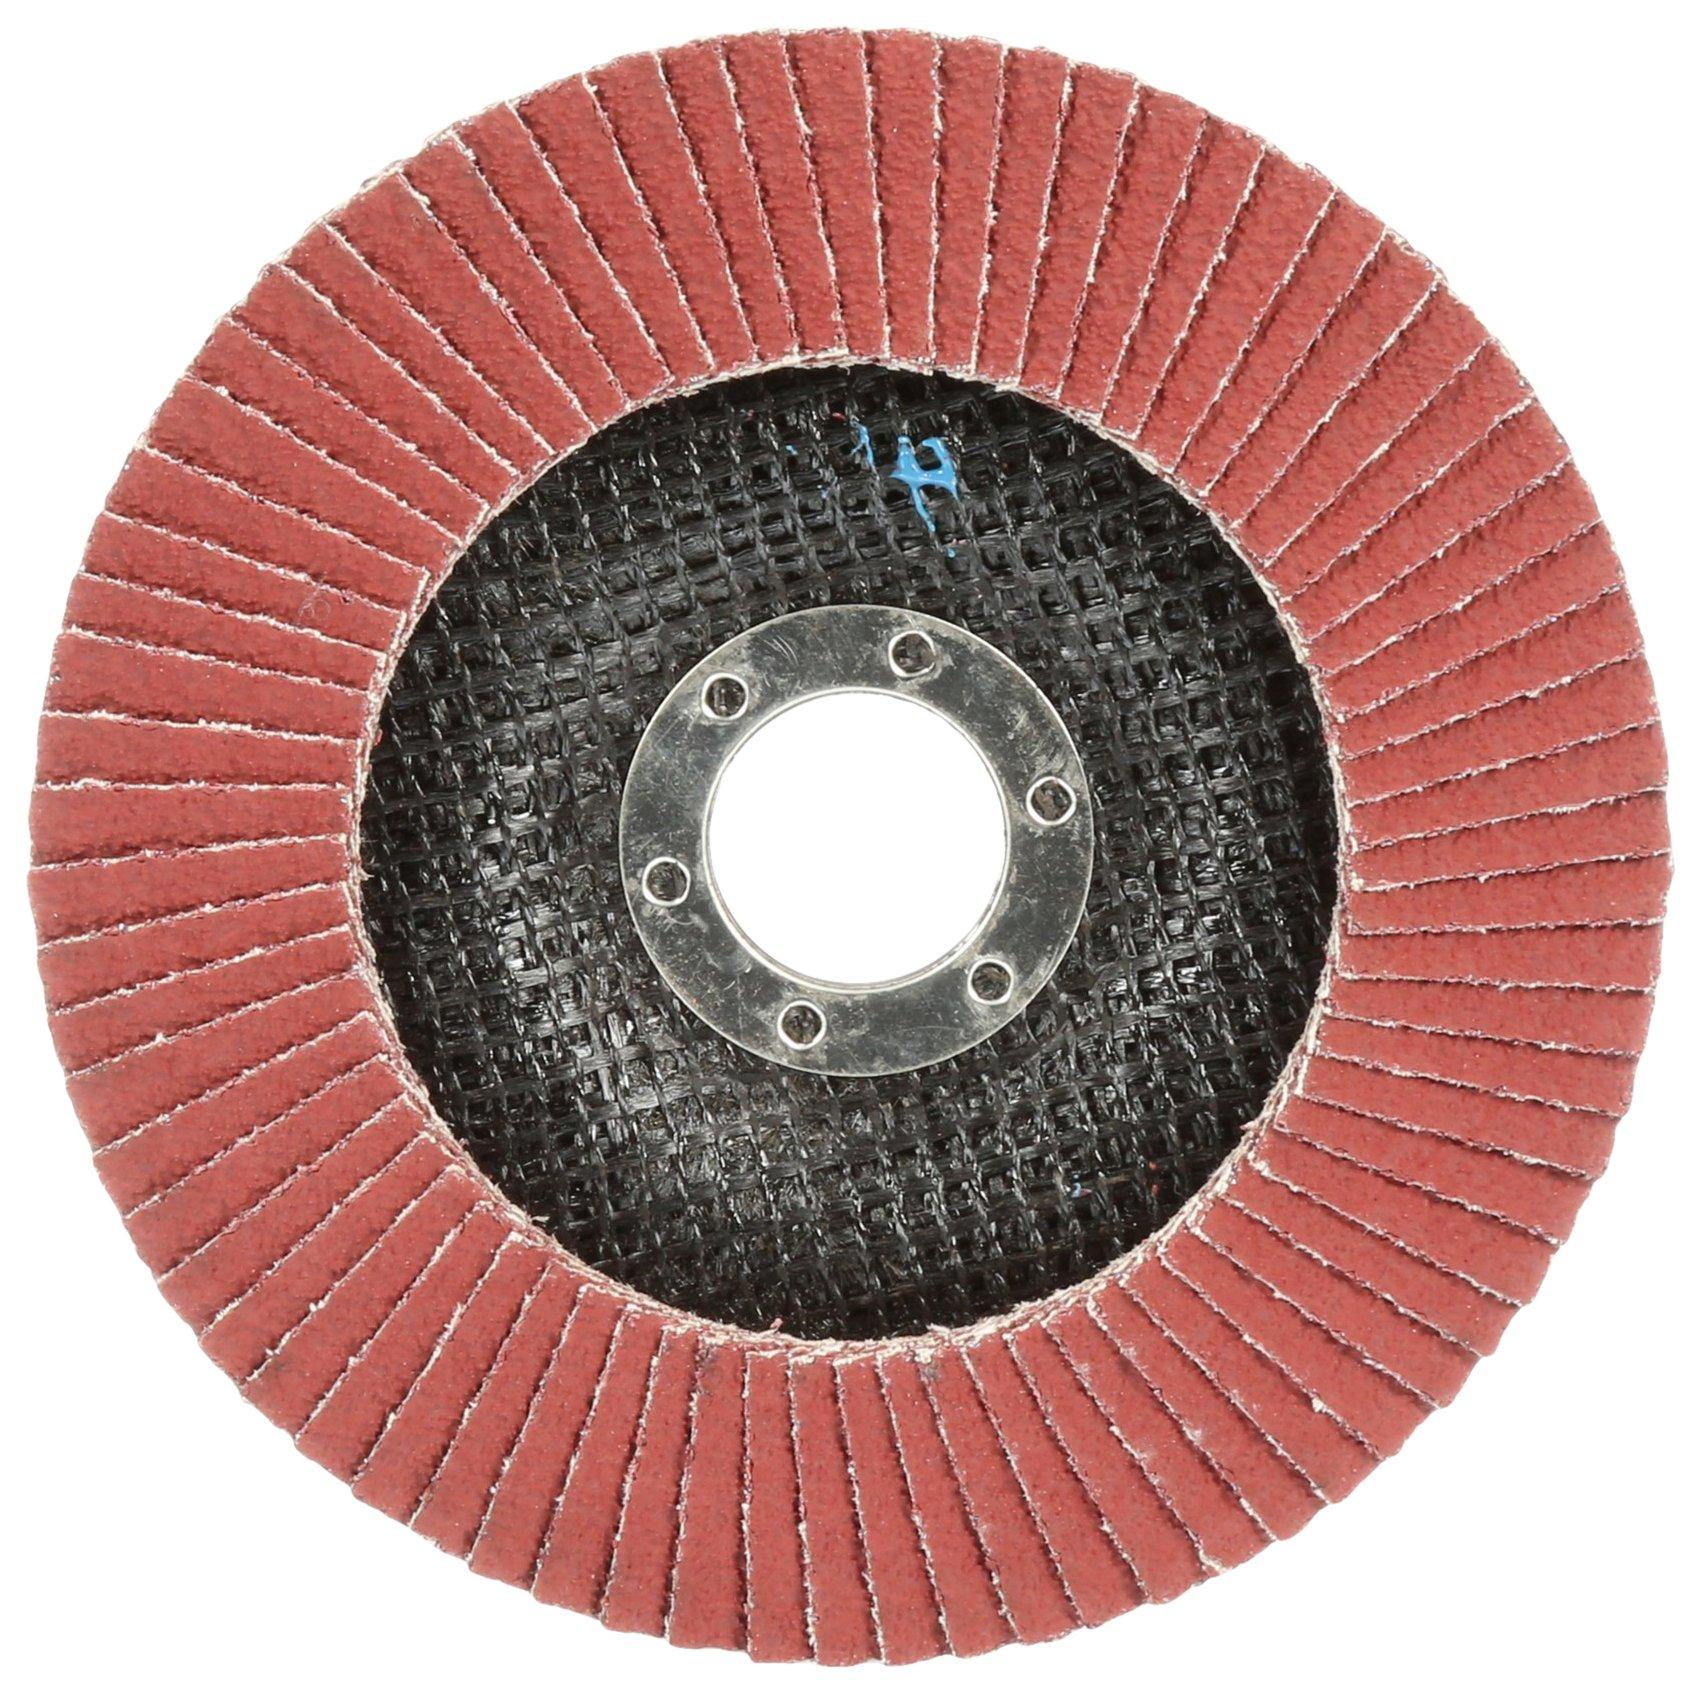 Cubitron II 64421 3M Flap Disc 969F, T29 7'' x 5/8-11, 40+ YF-Weight, Giant, Polyester Film Backing, Precision Shaped Ceramic Grain Abrasive Grit, 7'' Diameter